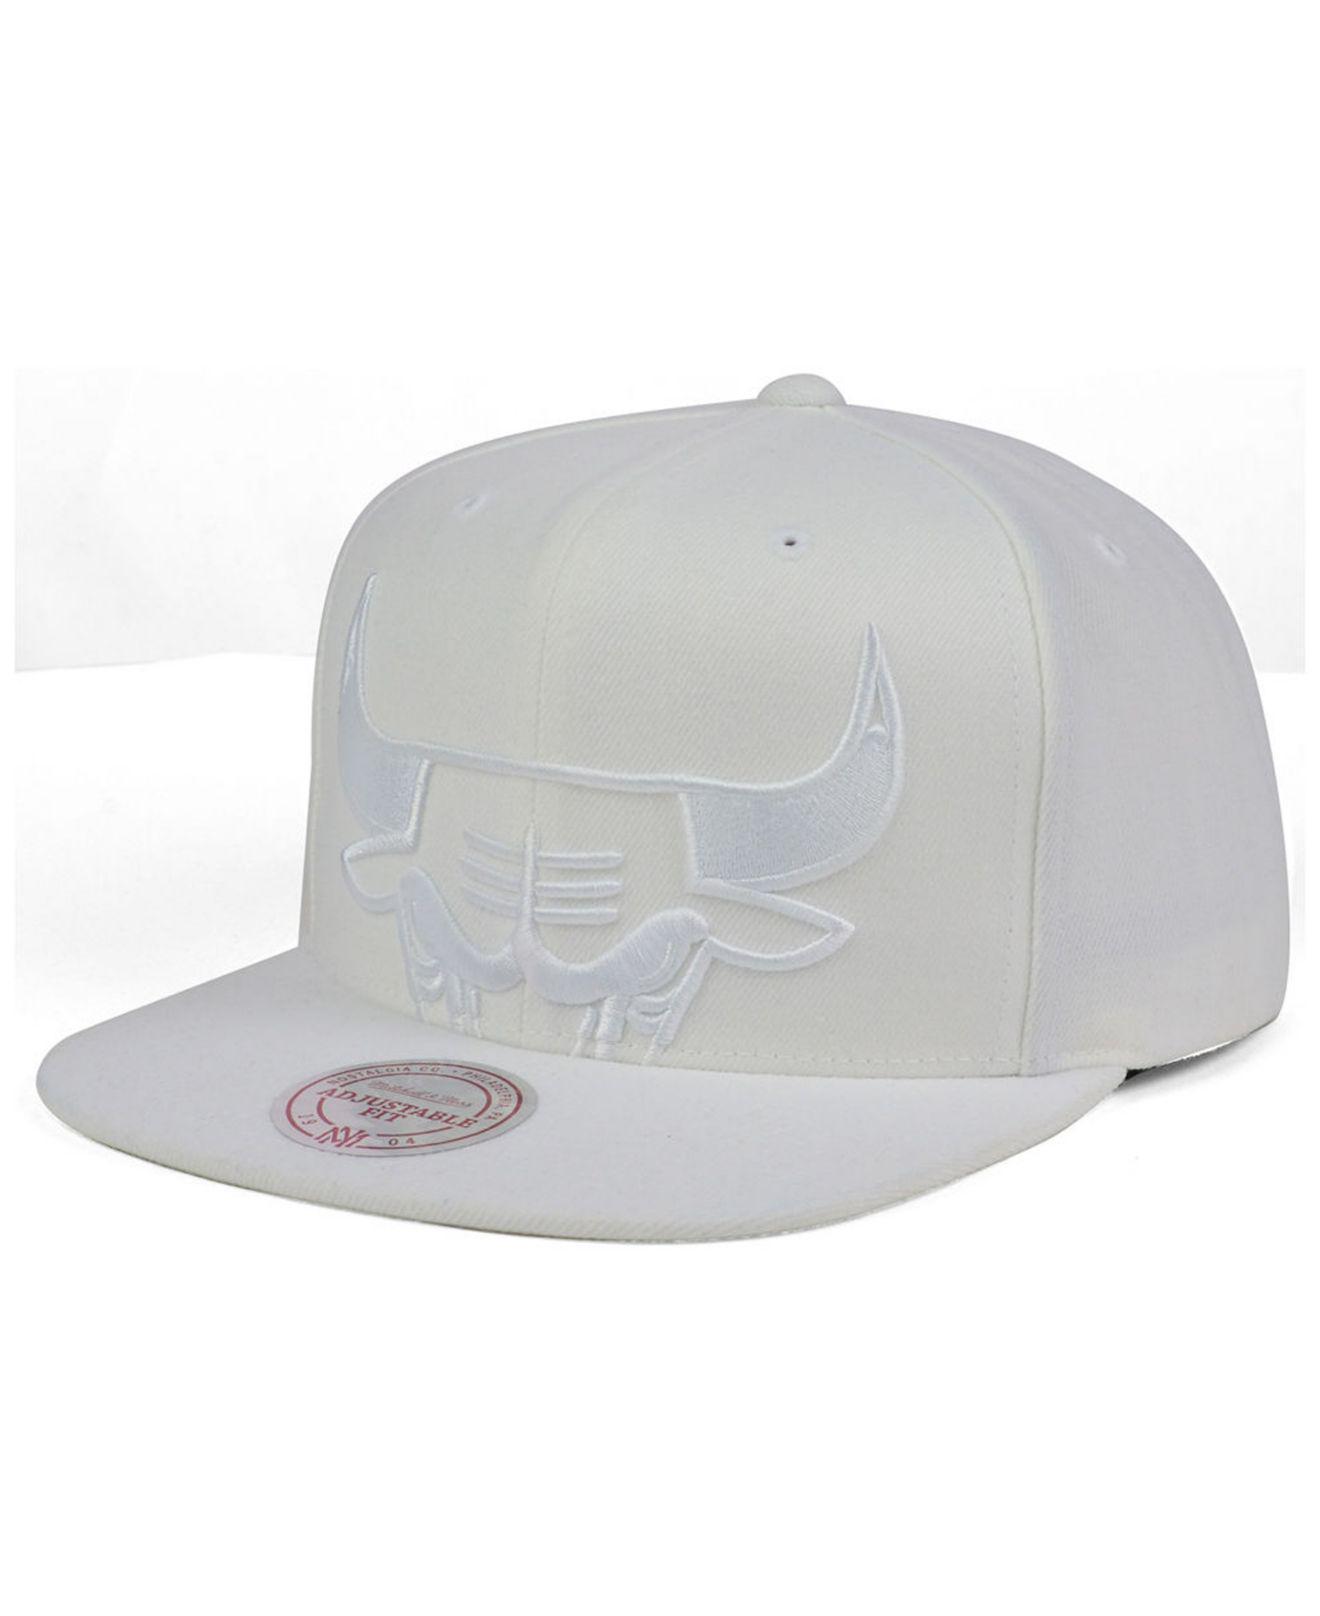 53c41ef93eb ... denmark lyst mitchell ness chicago bulls cropped xl logo snapback cap  in 3a815 3e138